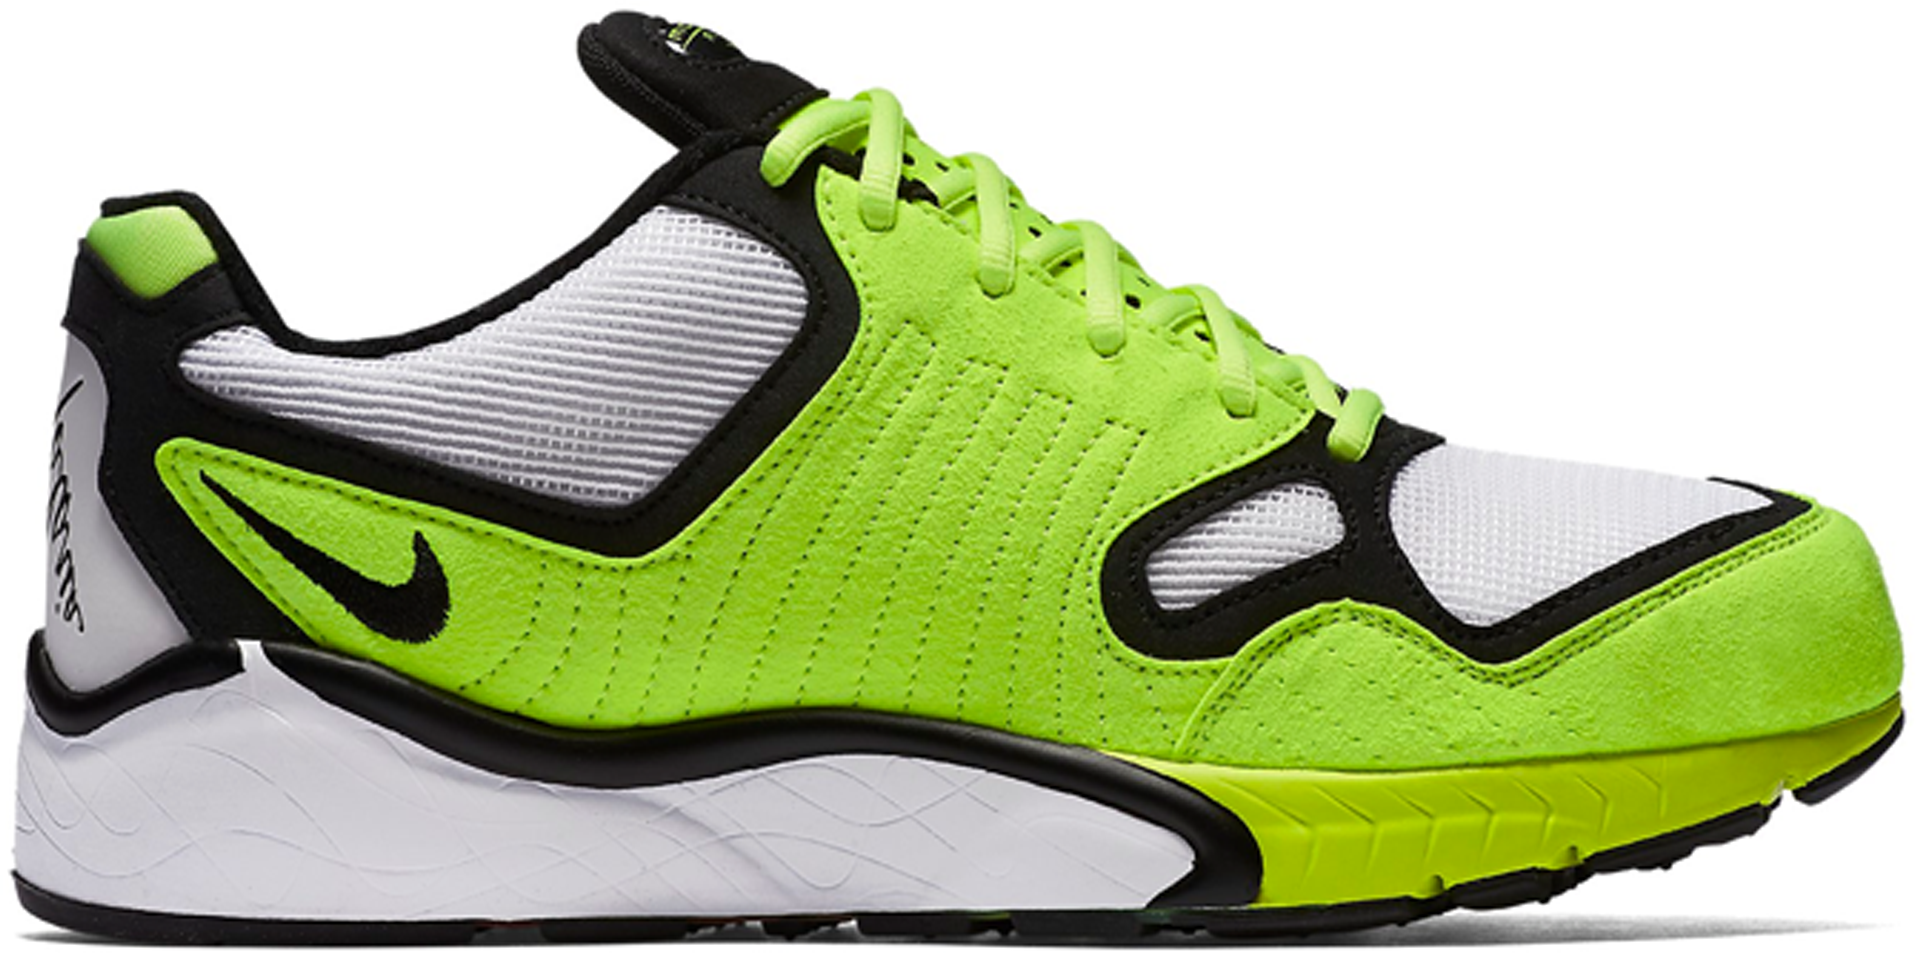 Nike Air Zoom Talaria Volt (2017